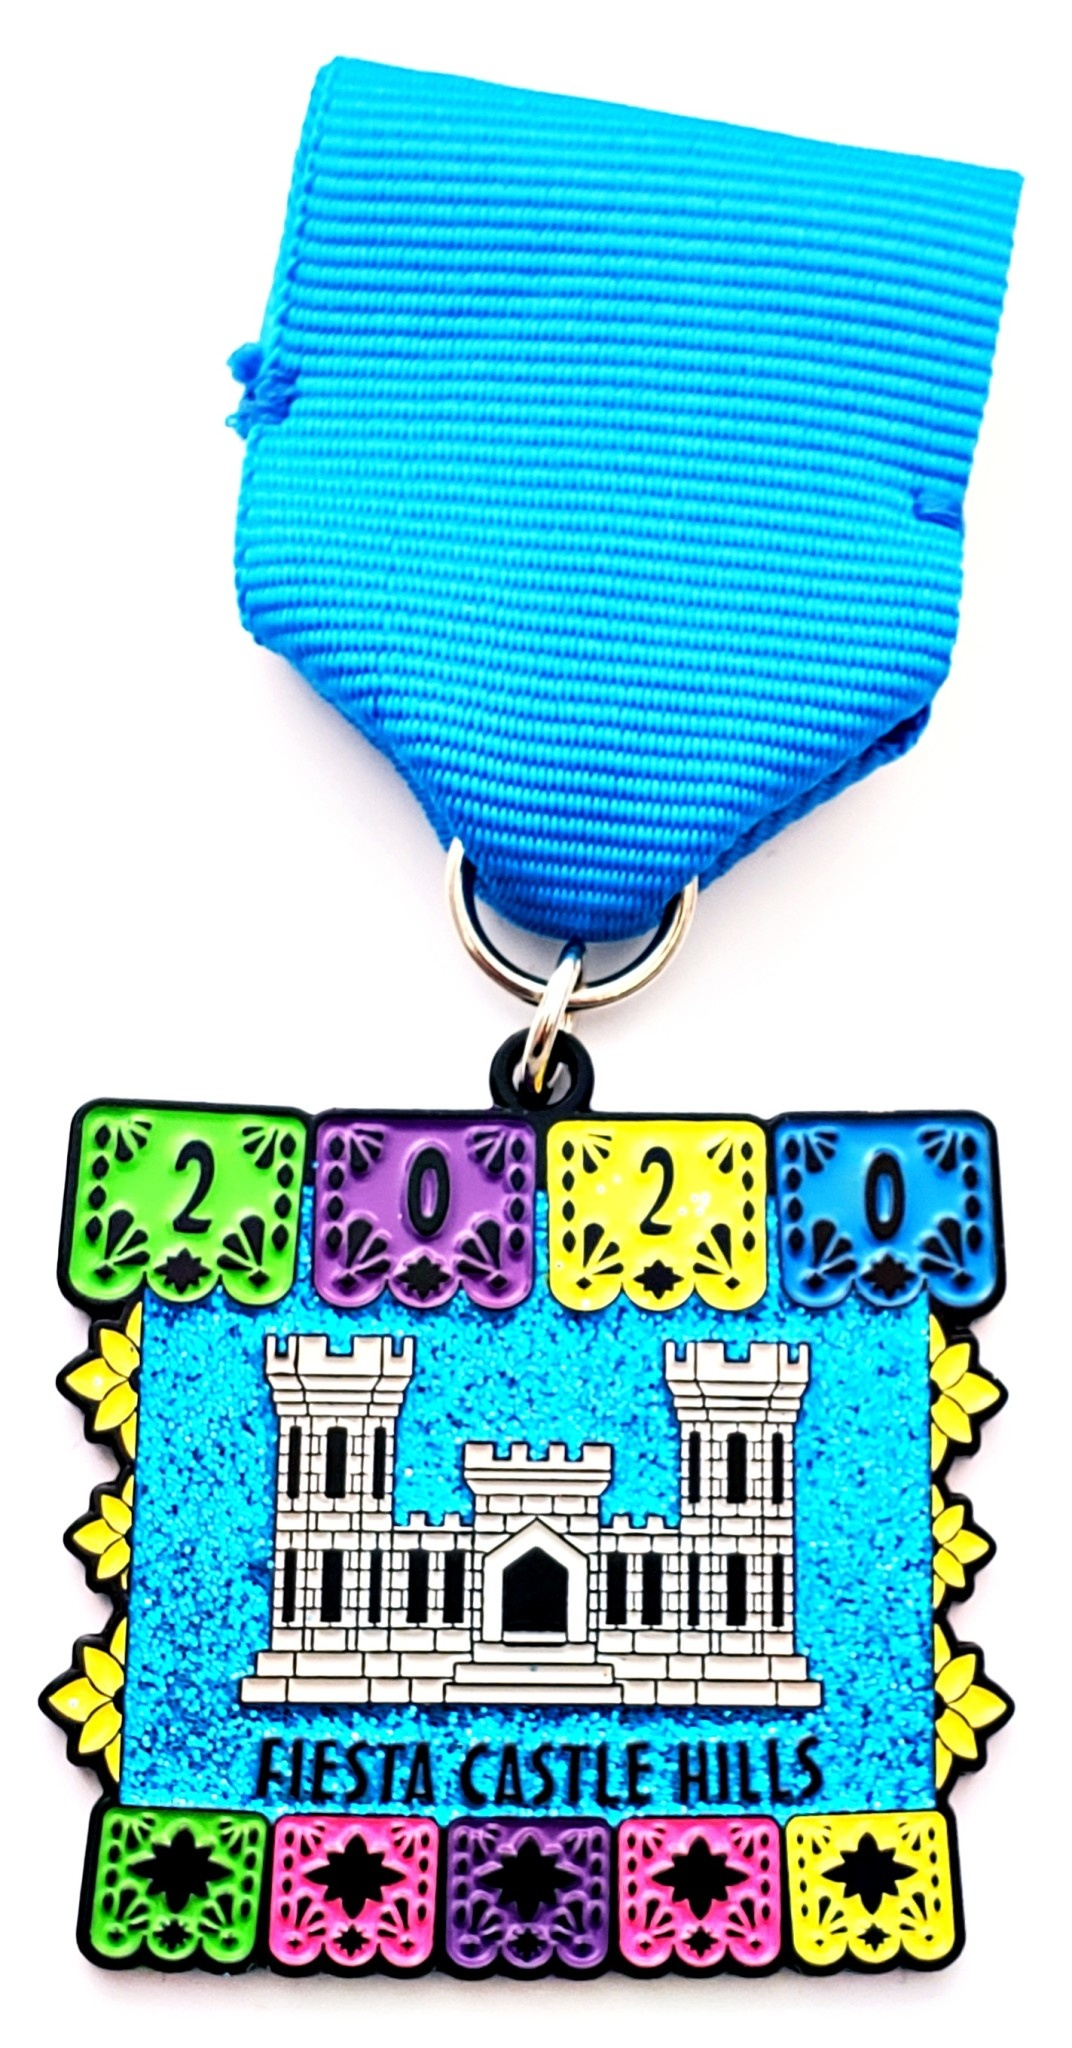 Christmas At Castle Hill 2020 88 Castle Hills Community Organization  Fiesta Castle Hills  Medal